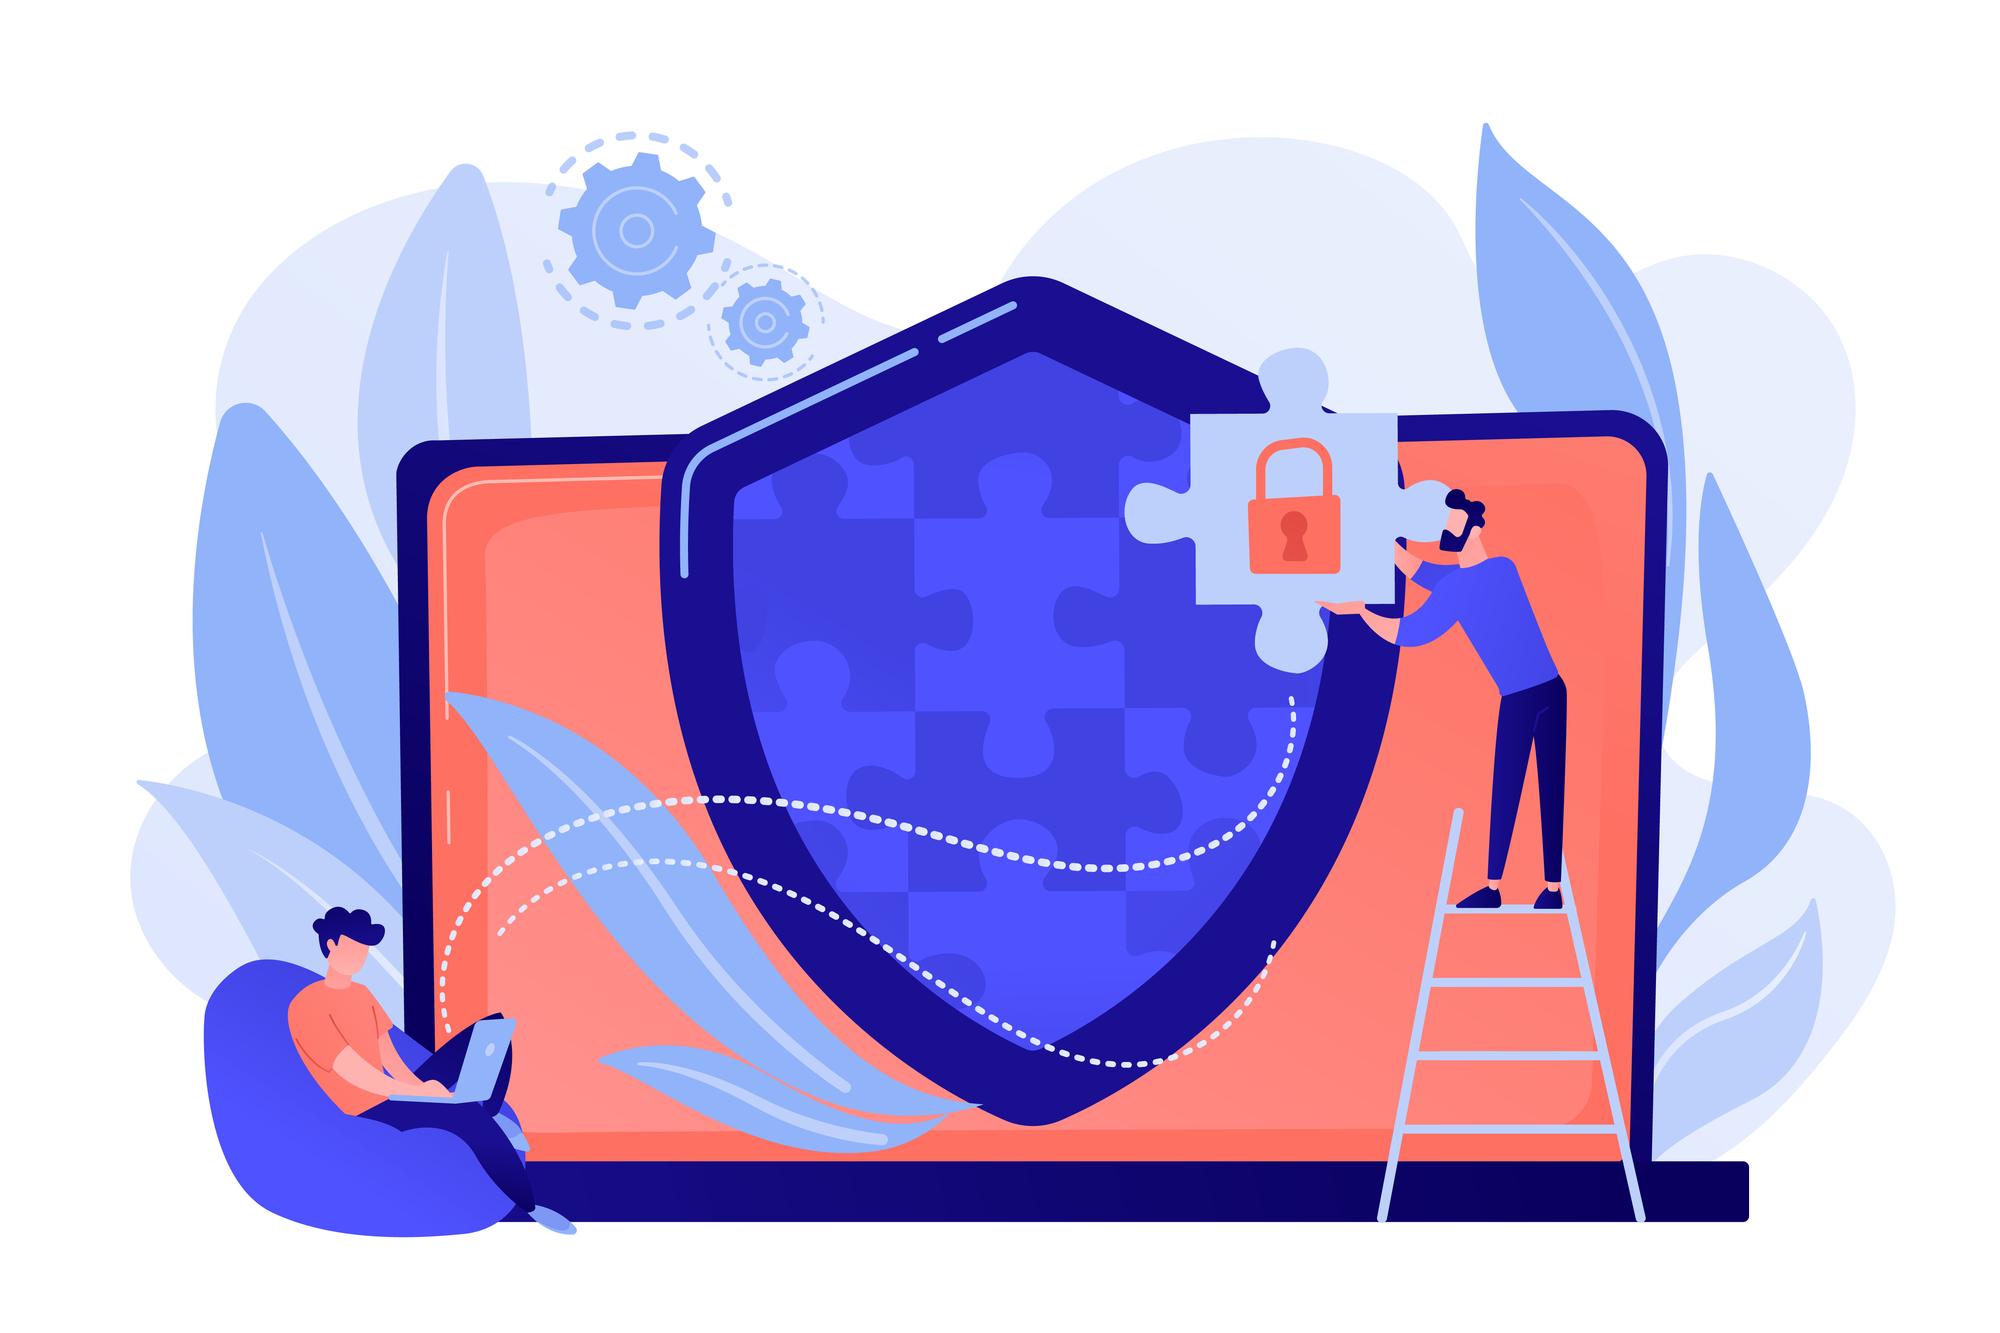 Azure Key Vaultとは?シークレットの管理でセキュリティ対策サムネイル